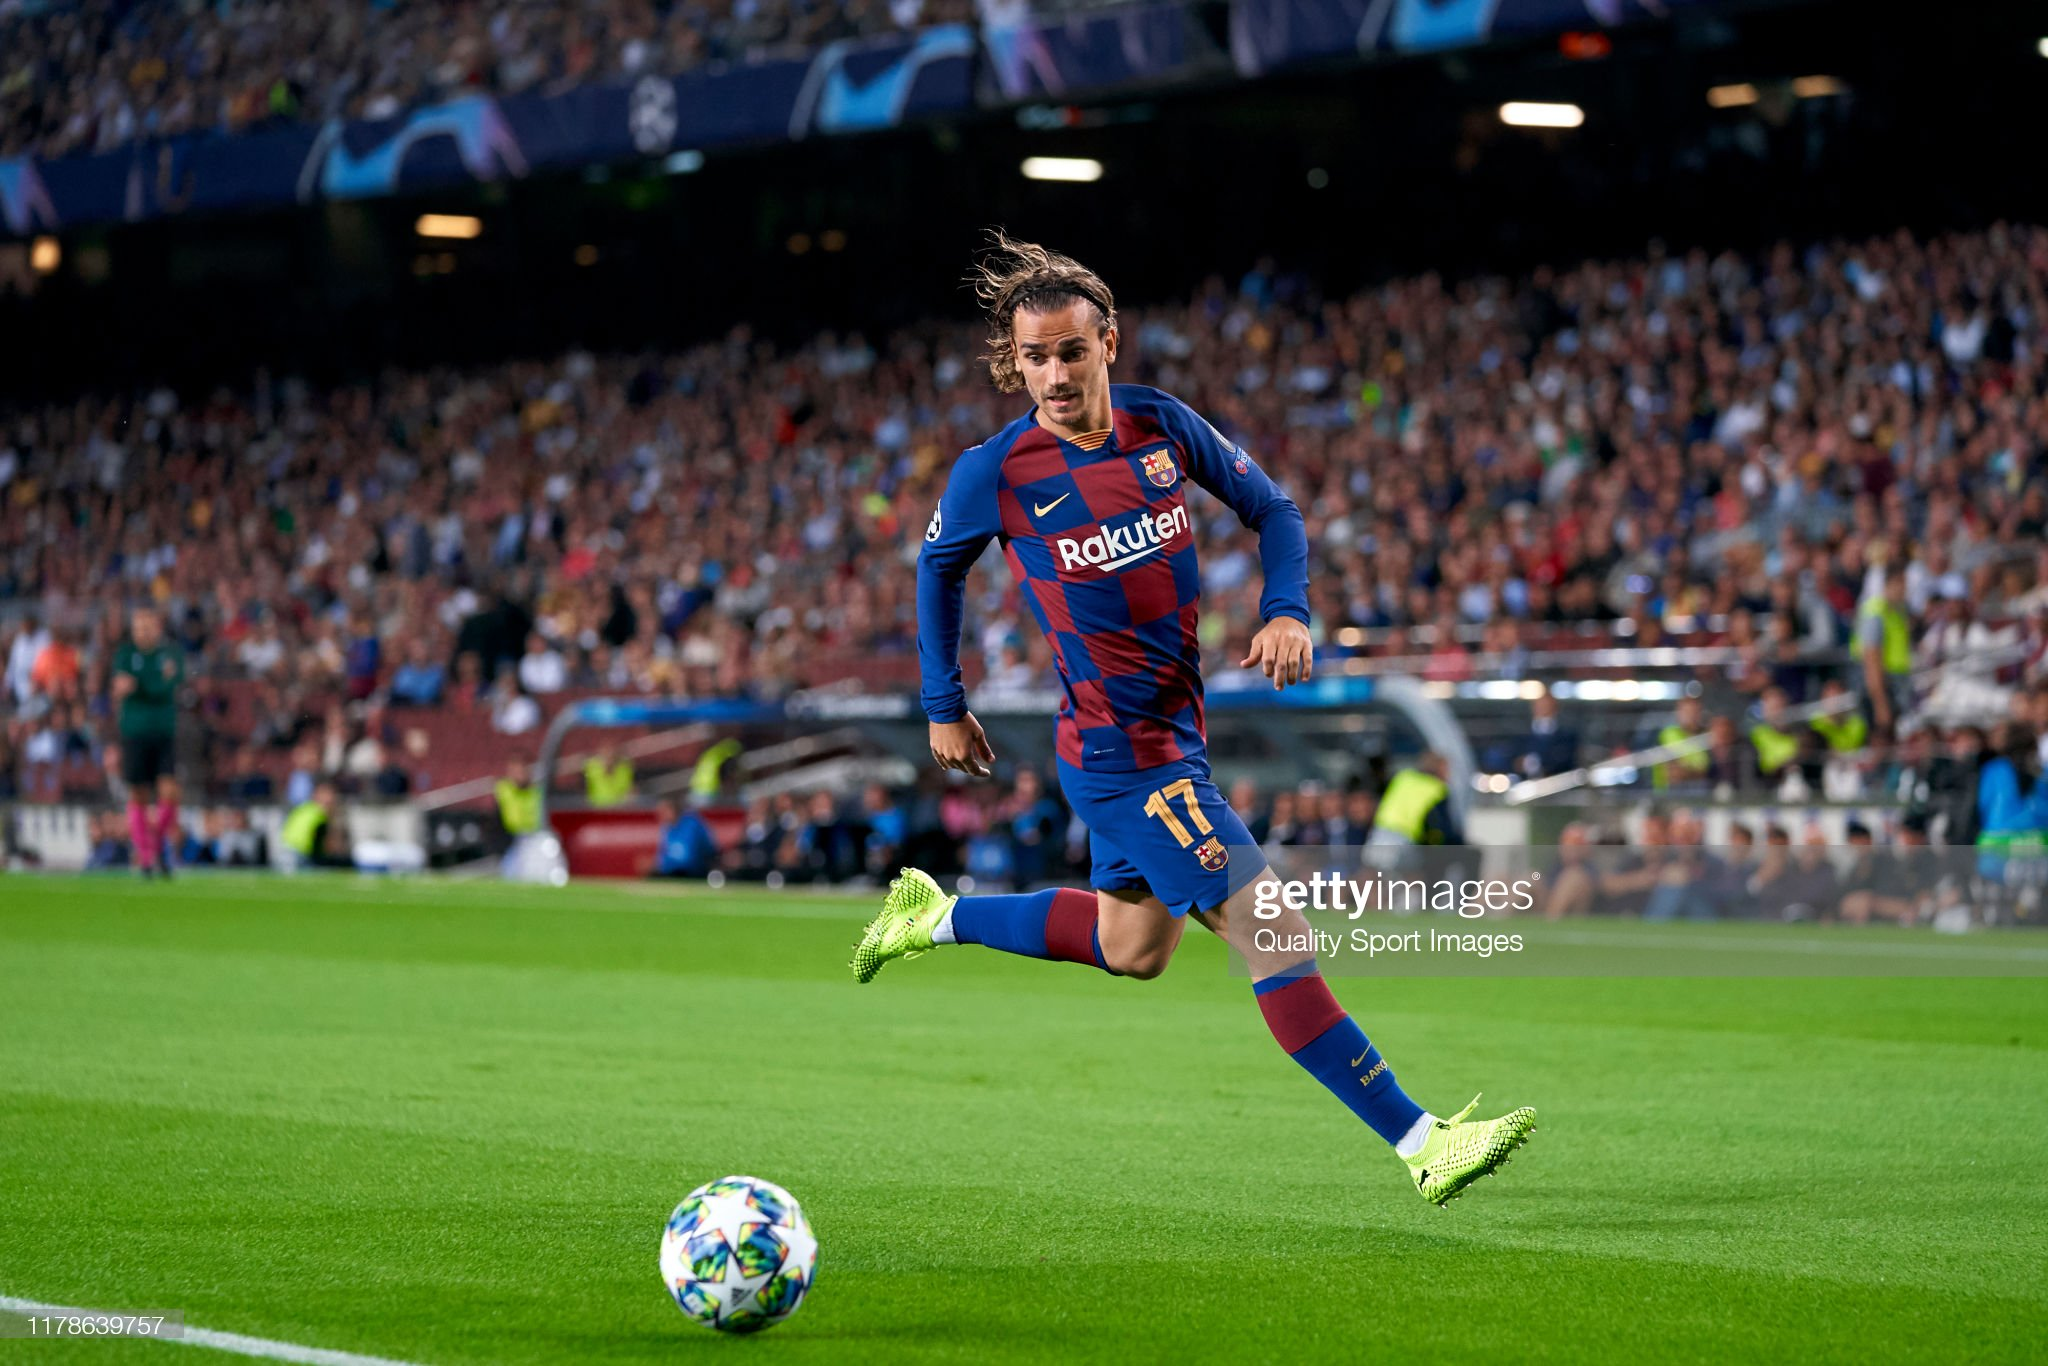 صور مباراة : برشلونة - إنتر 2-1 ( 02-10-2019 )  Antoine-griezmann-of-fc-barcelona-with-the-ball-during-the-uefa-f-picture-id1178639757?s=2048x2048